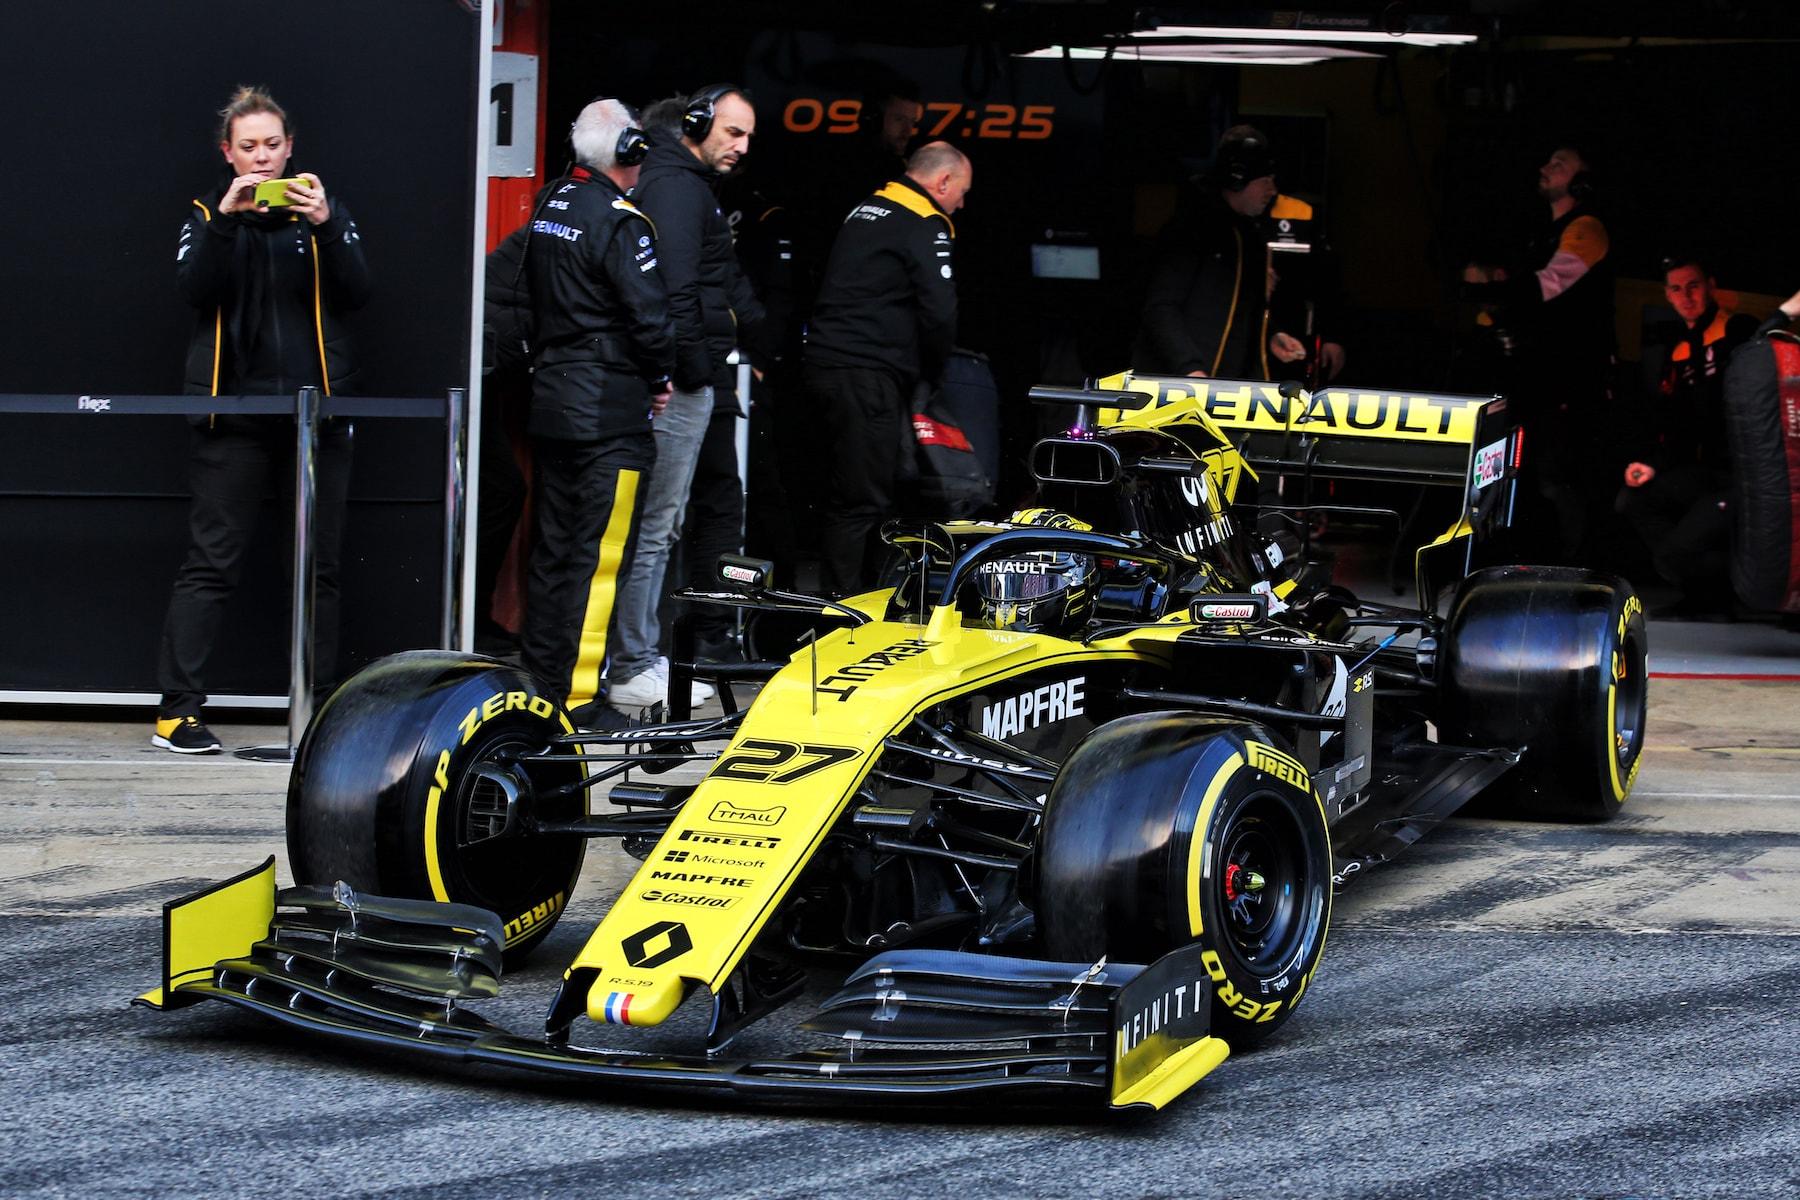 2019 Nico Hulkenberg   Renault RS19   2019 Barcelona T1 D1 1 copy.jpg